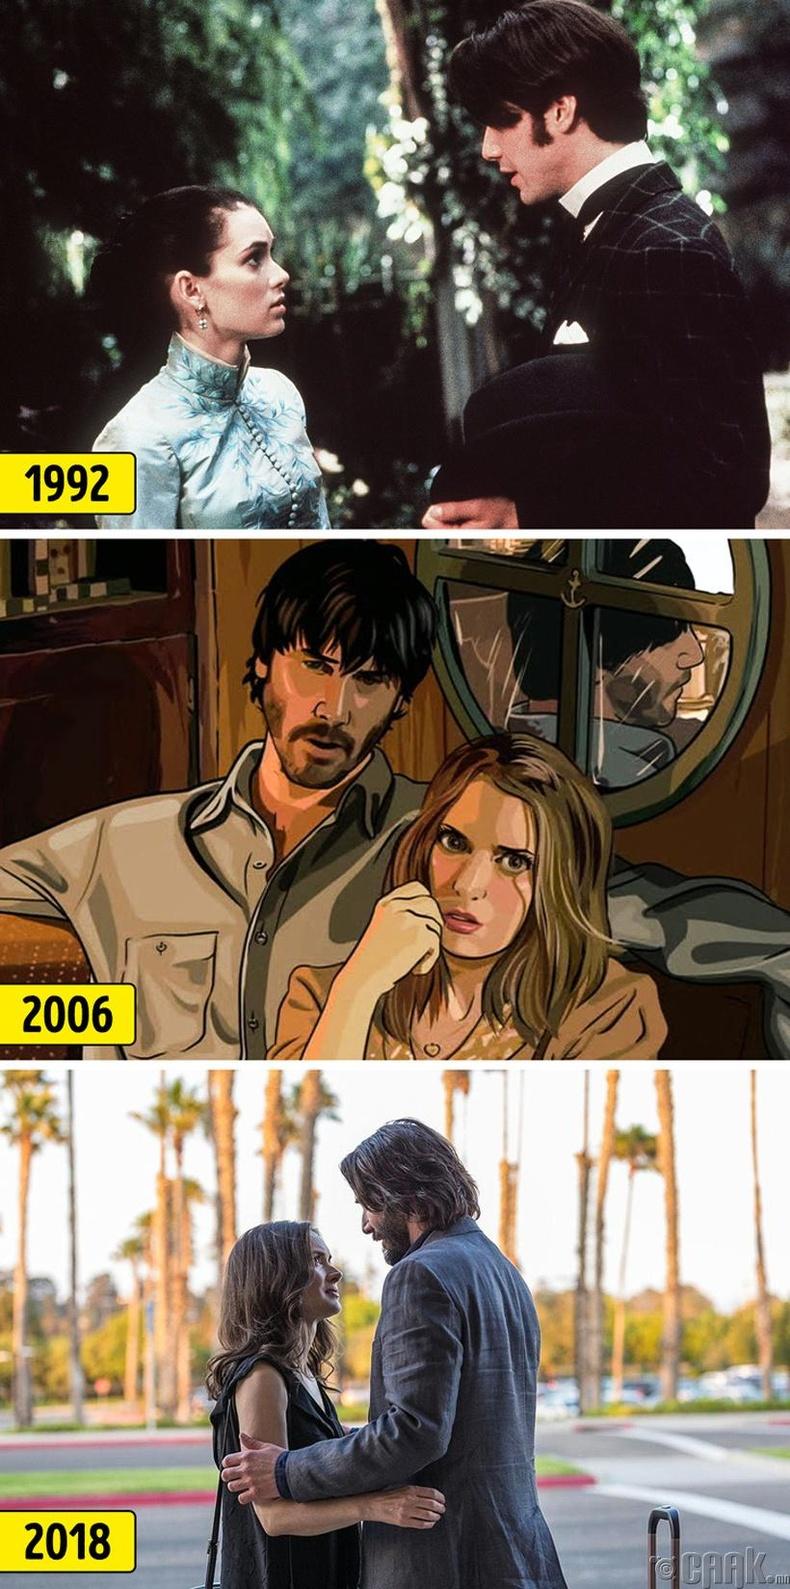 Кеану Ривз болон Вайнона Райдер (Keanu Reeves, Winona Ryder)